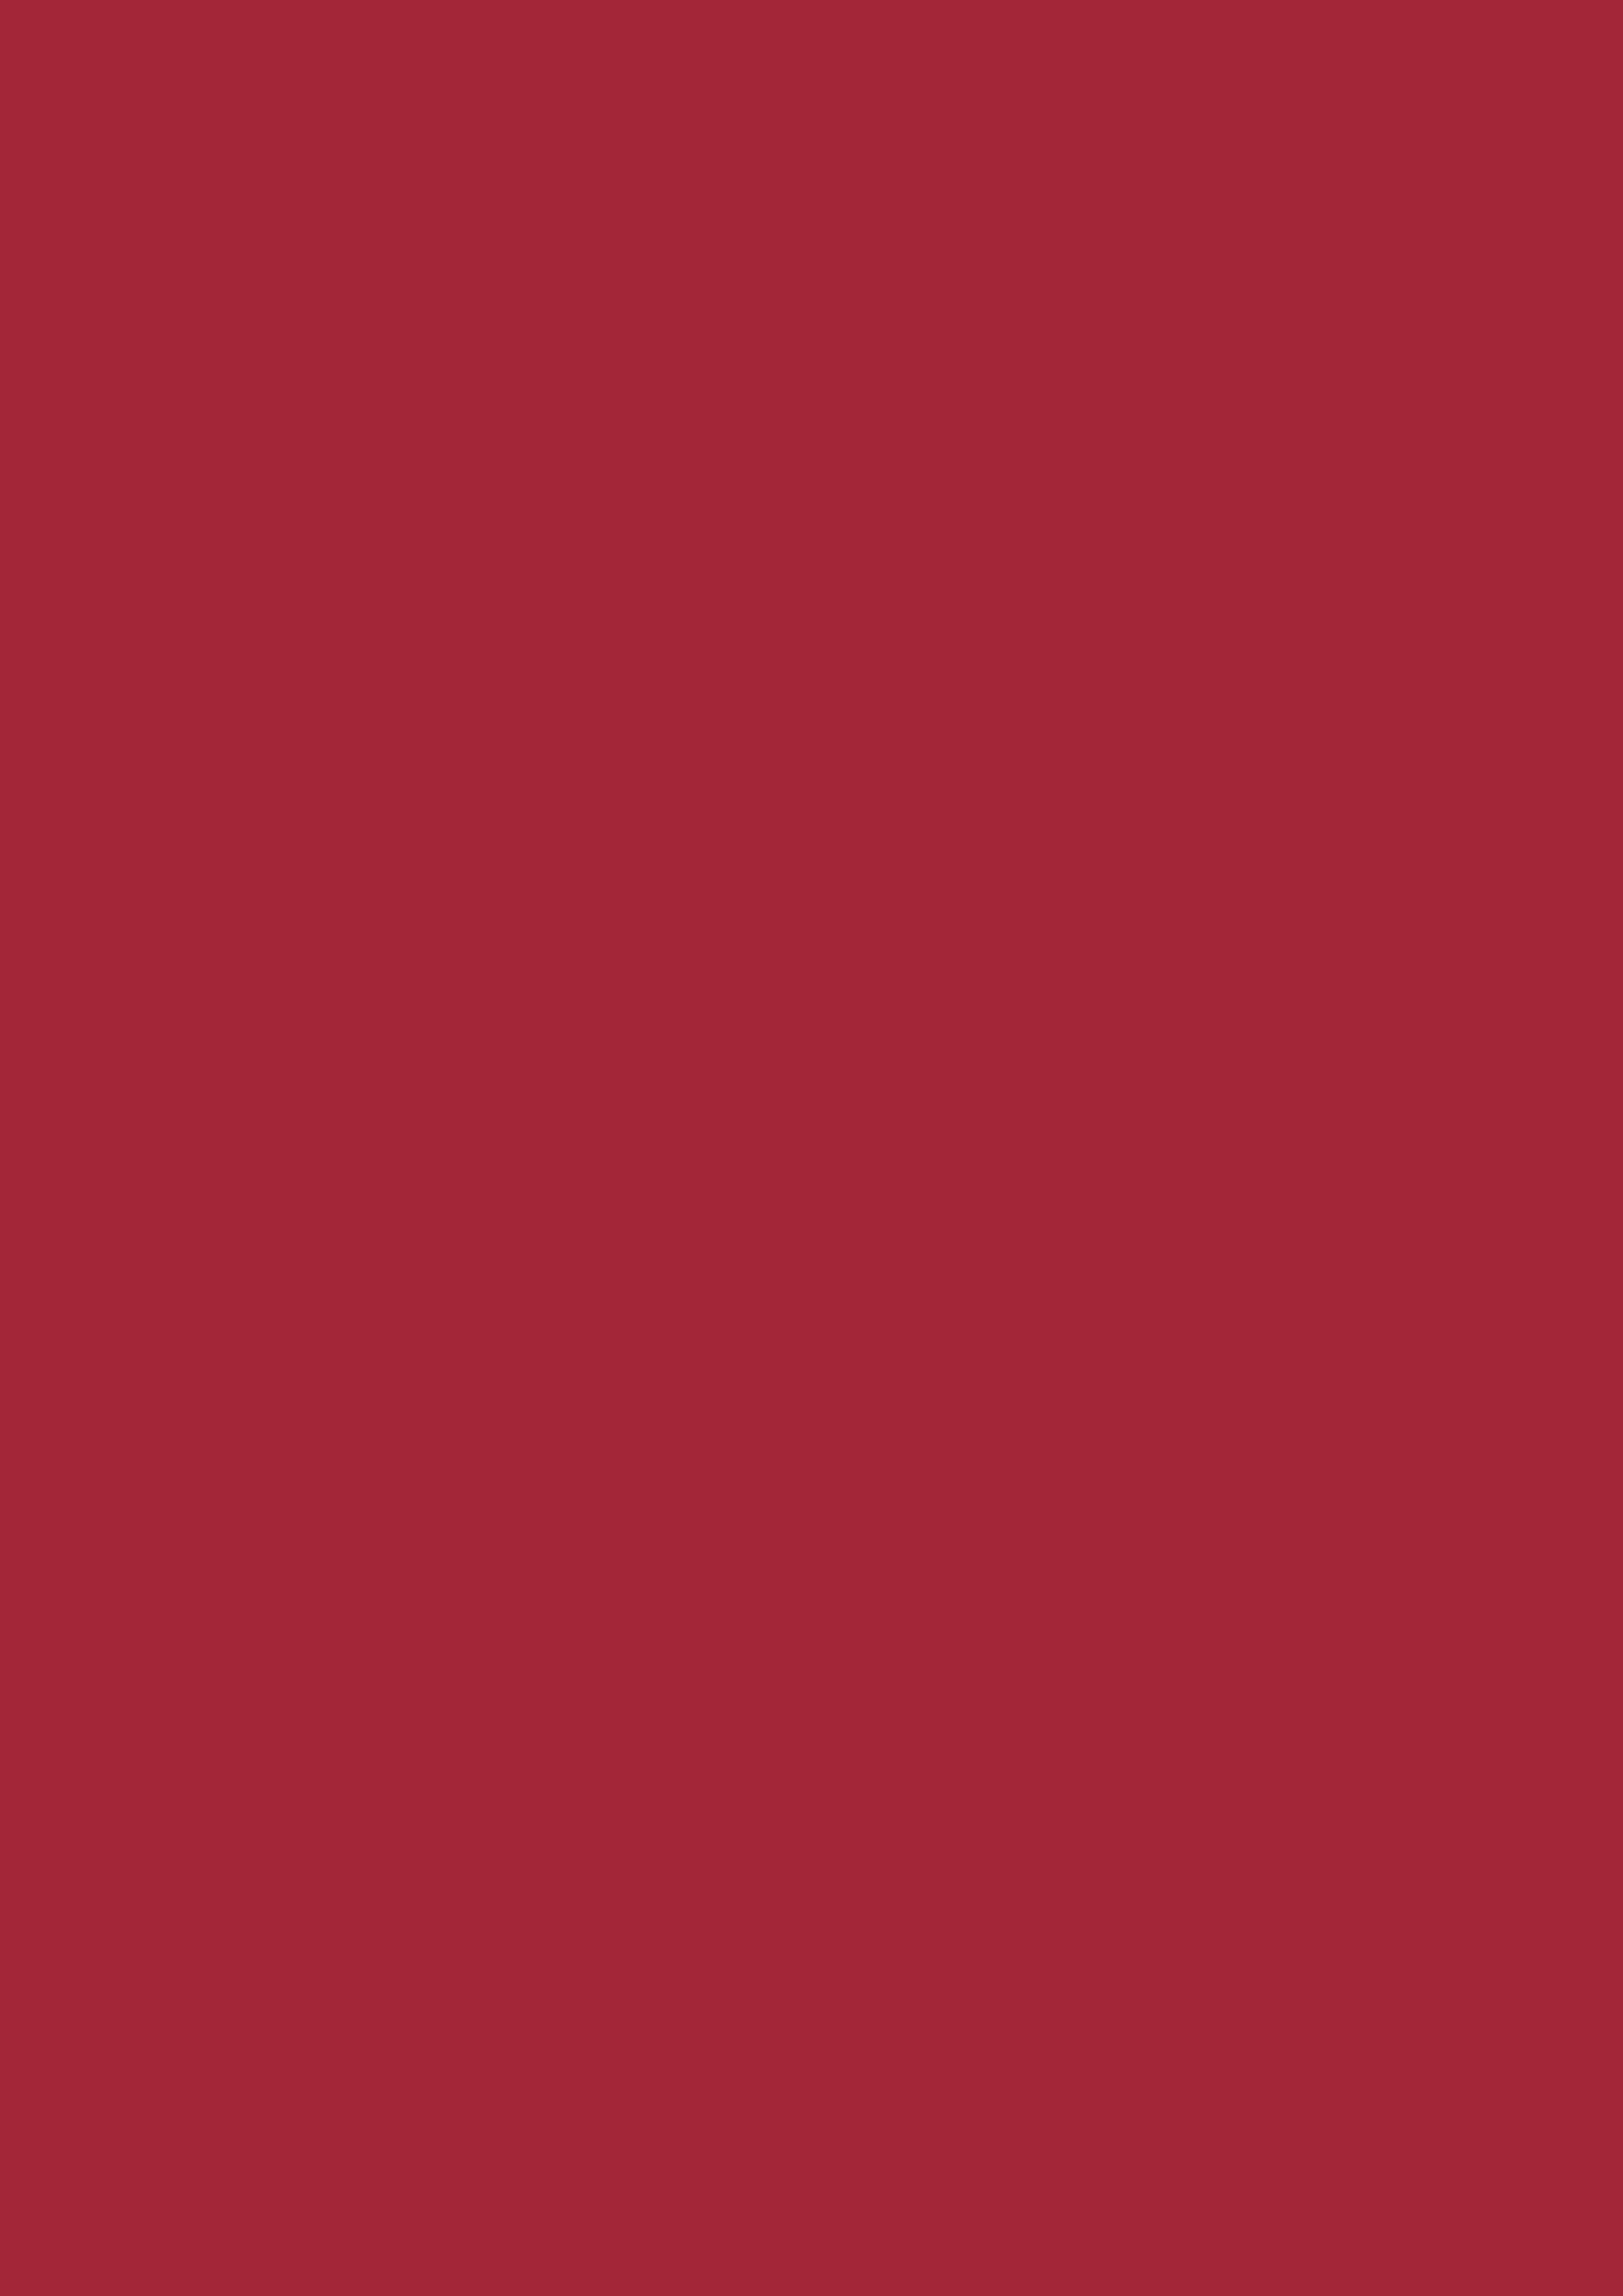 2480x3508 Alabama Crimson Solid Color Background